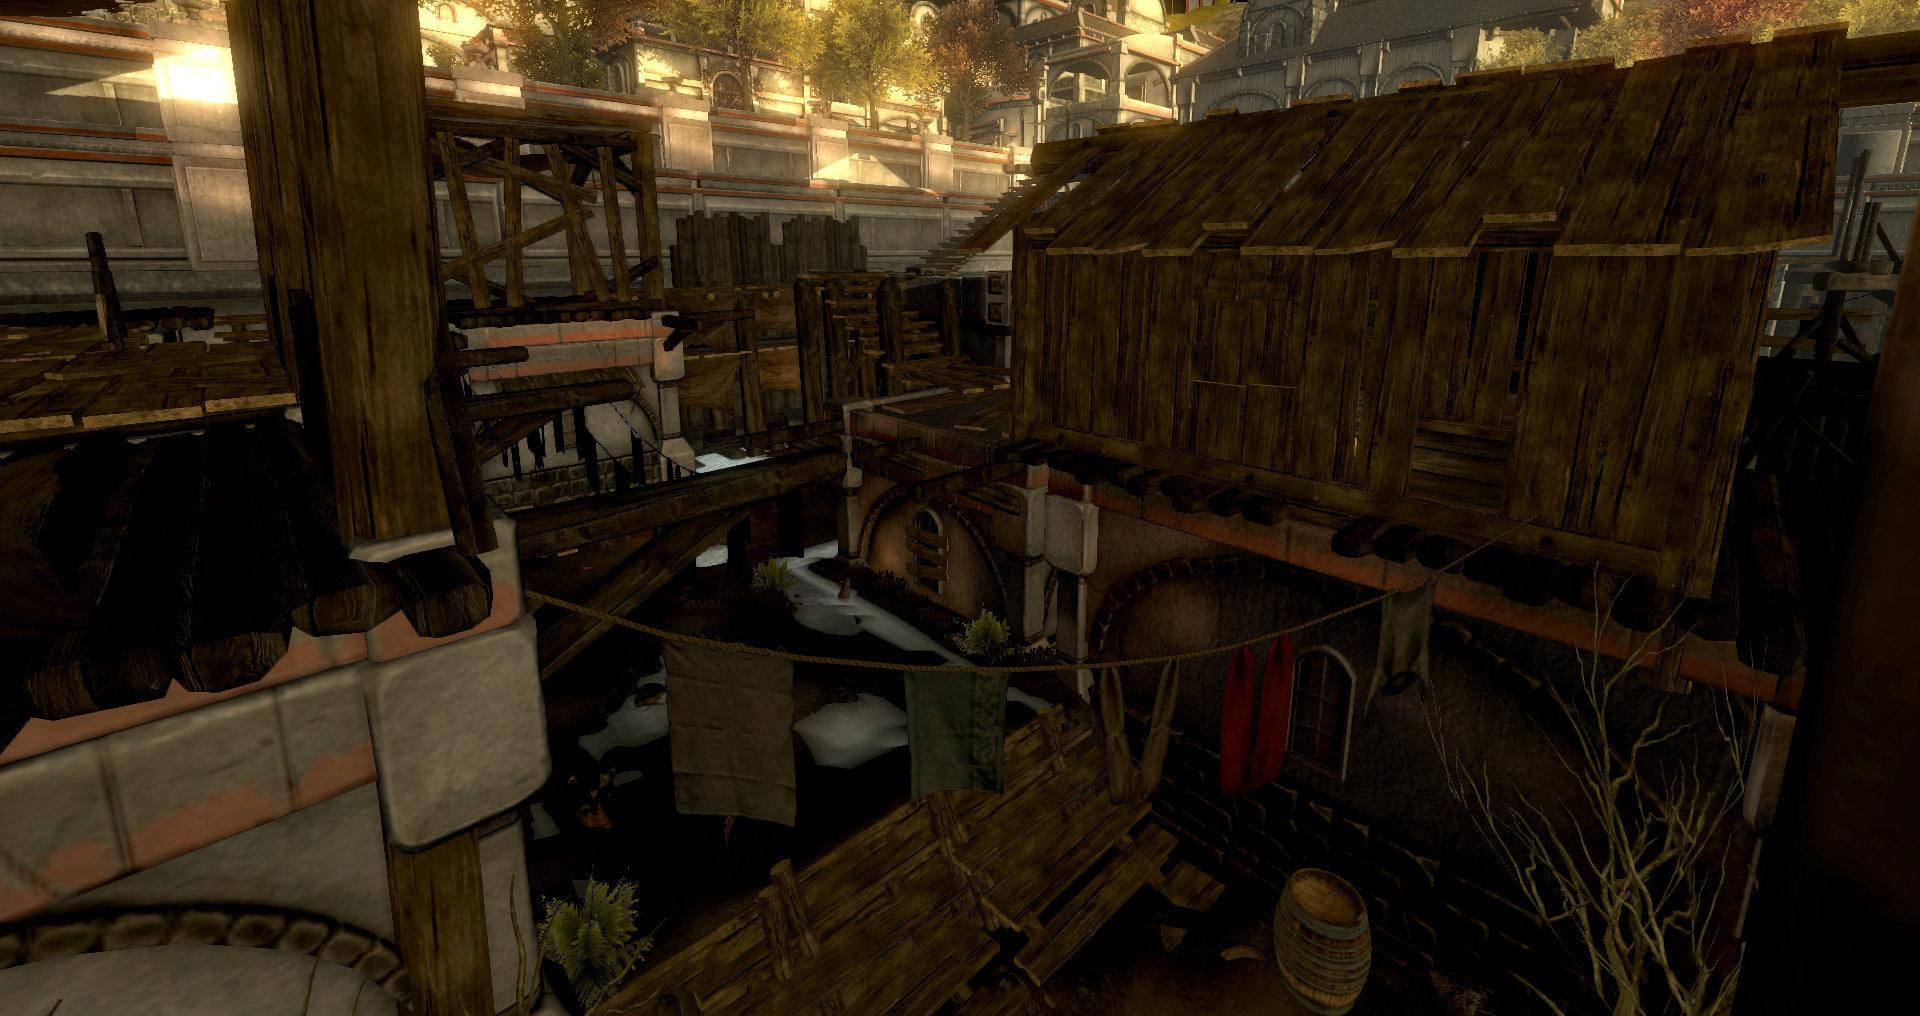 karthal slums